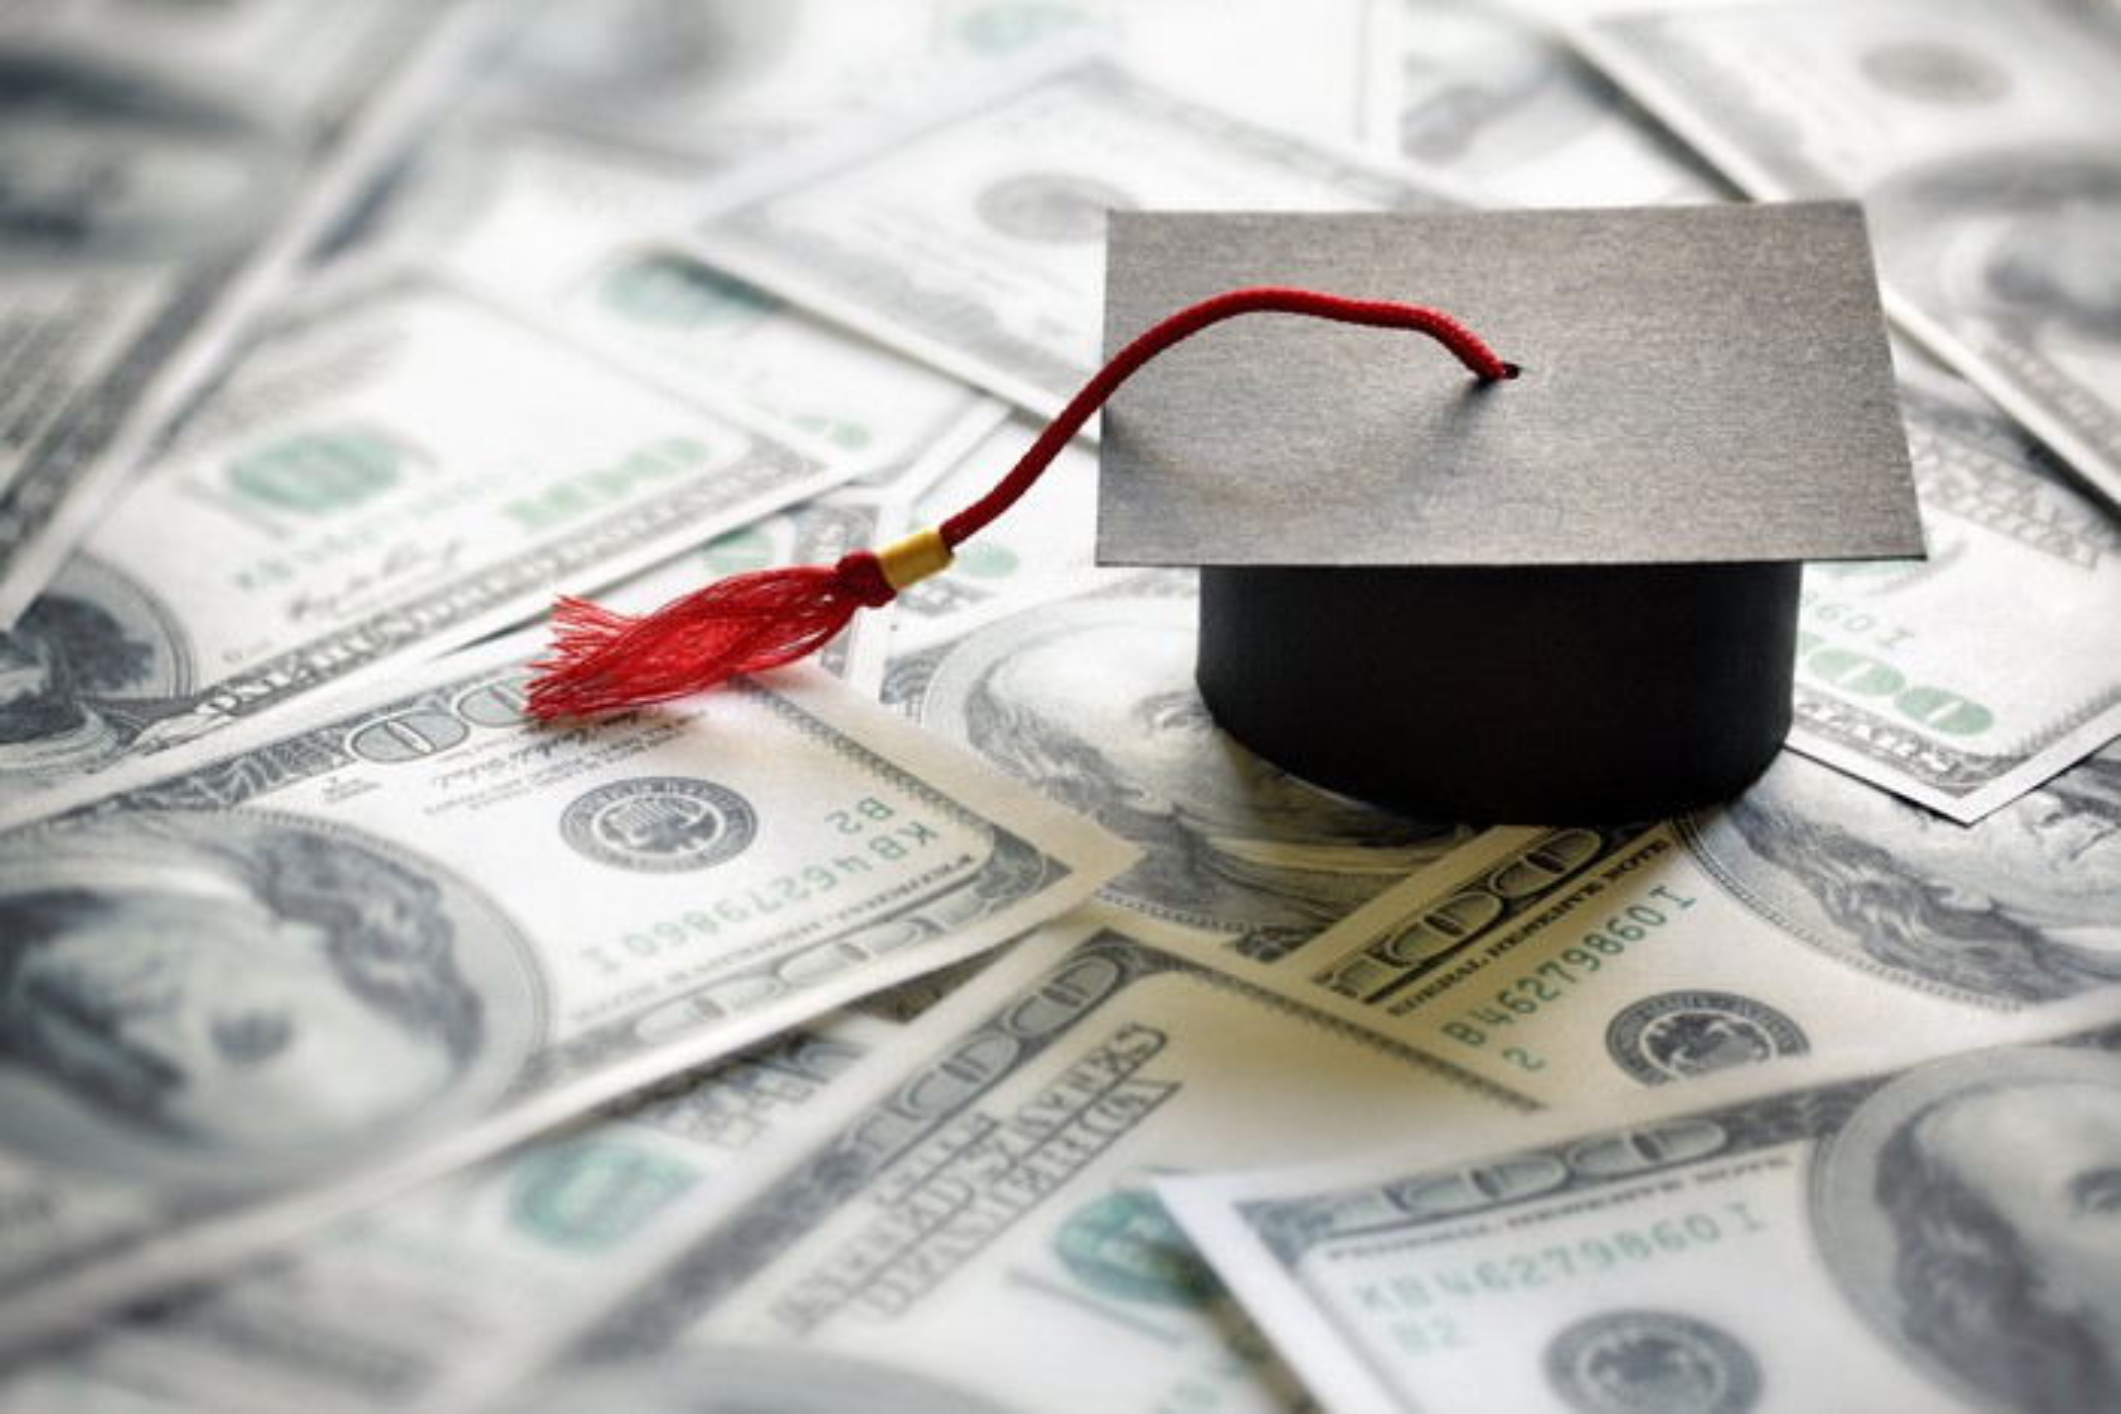 Graduation cap on a pile of 100-dollar bills